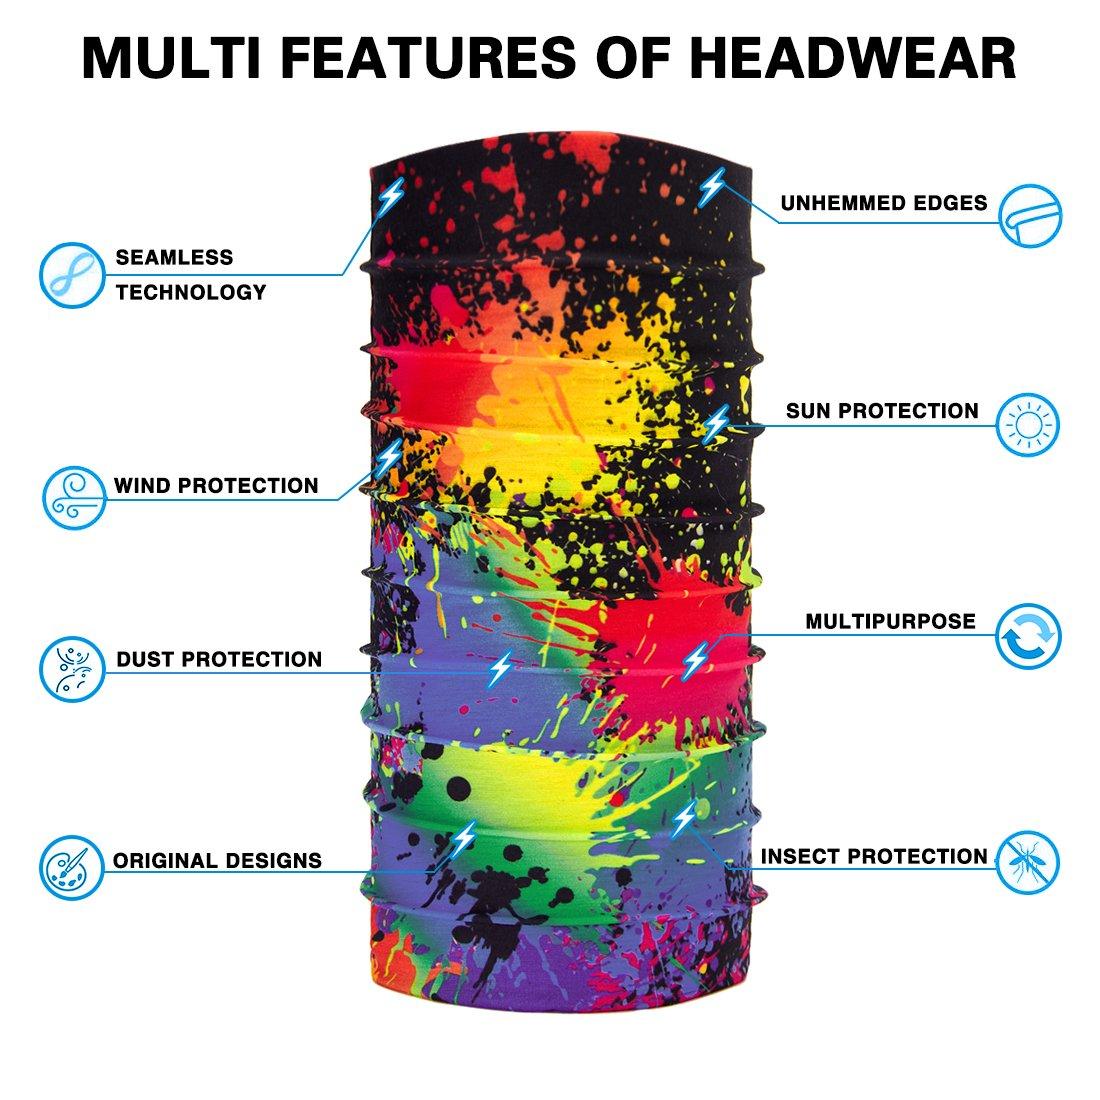 TUONROAD 3D Printed Colorful Paint Tie-Dye Black Seamless Hot Bandana Headband Mask Sweatband Lady MensMultifunctional Headwear Head Wrap Neck Gaiter Face Sun Mask for Cycling Fishing Hunting